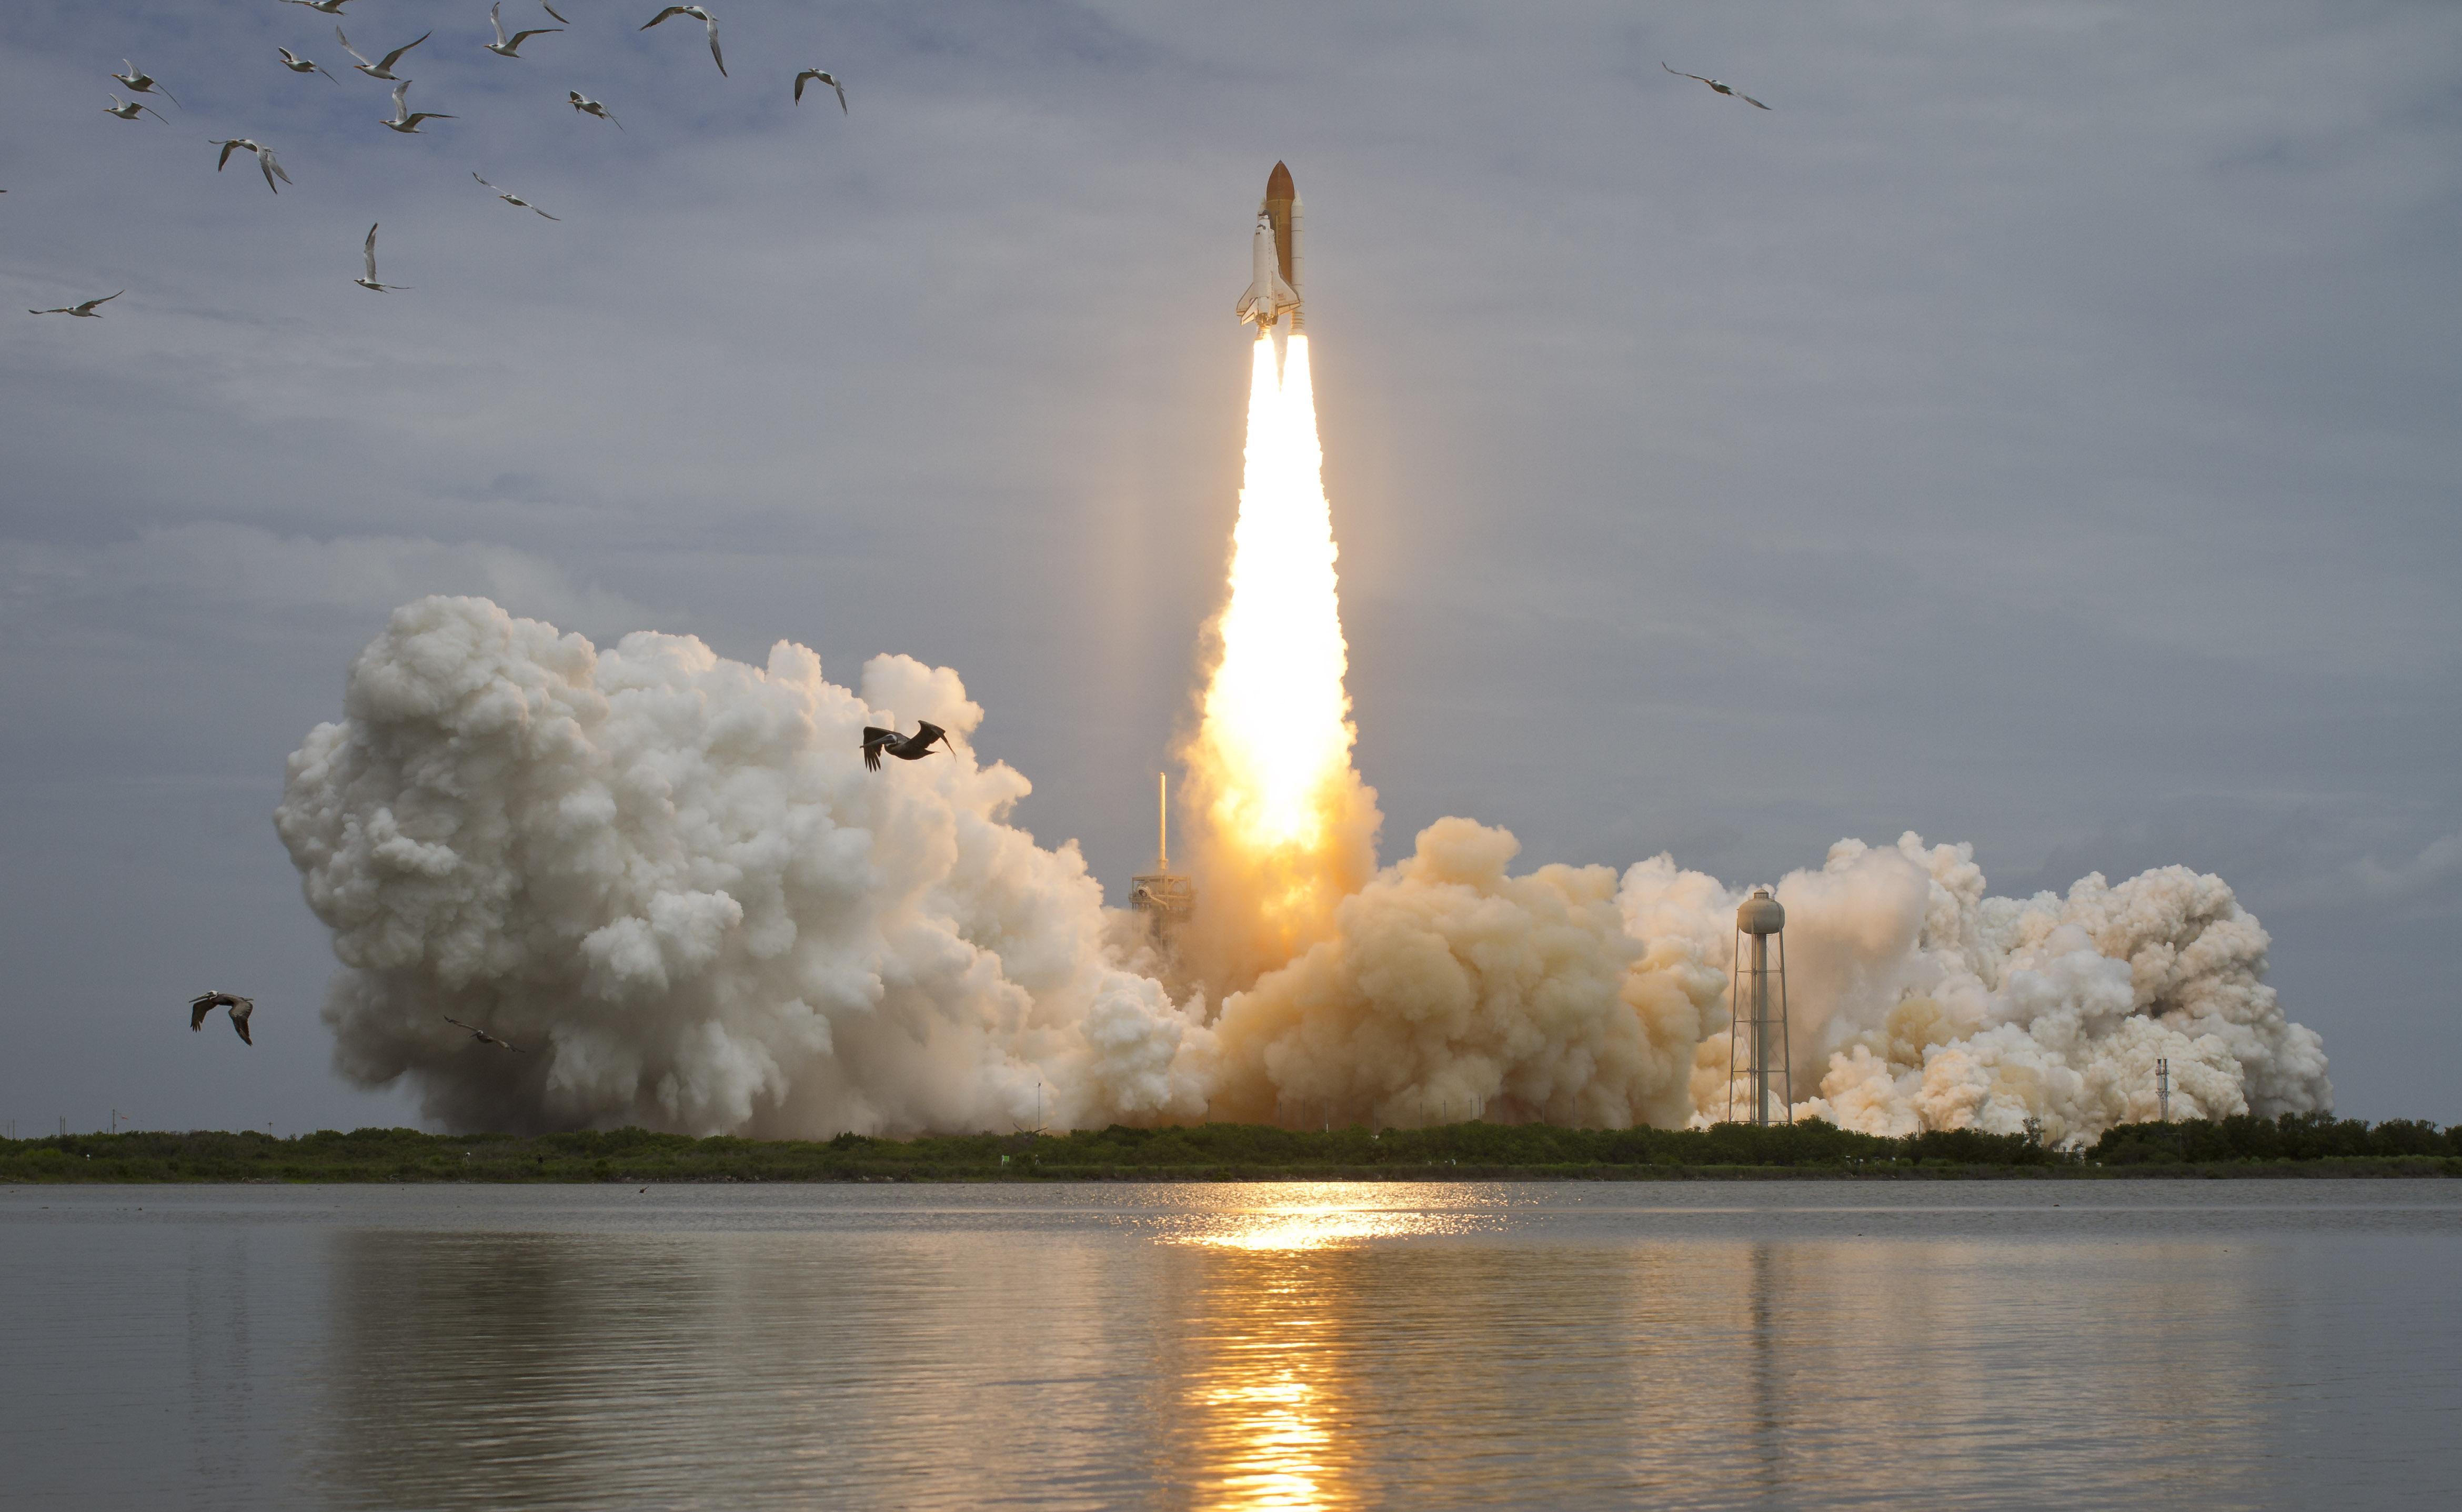 nasa landing today - photo #25